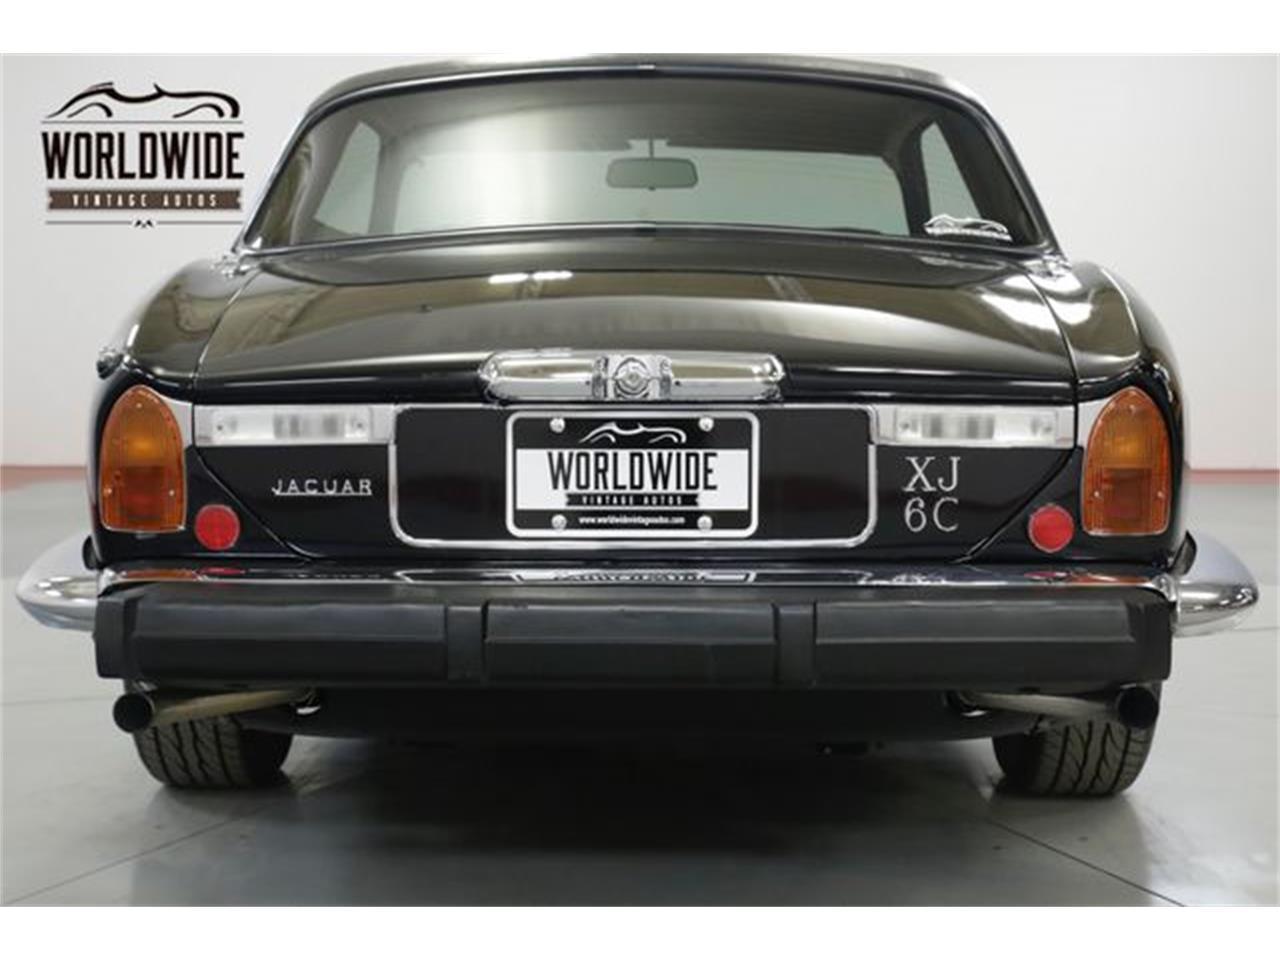 Large Picture of 1976 Jaguar XJ6 located in Denver  Colorado - PSG5